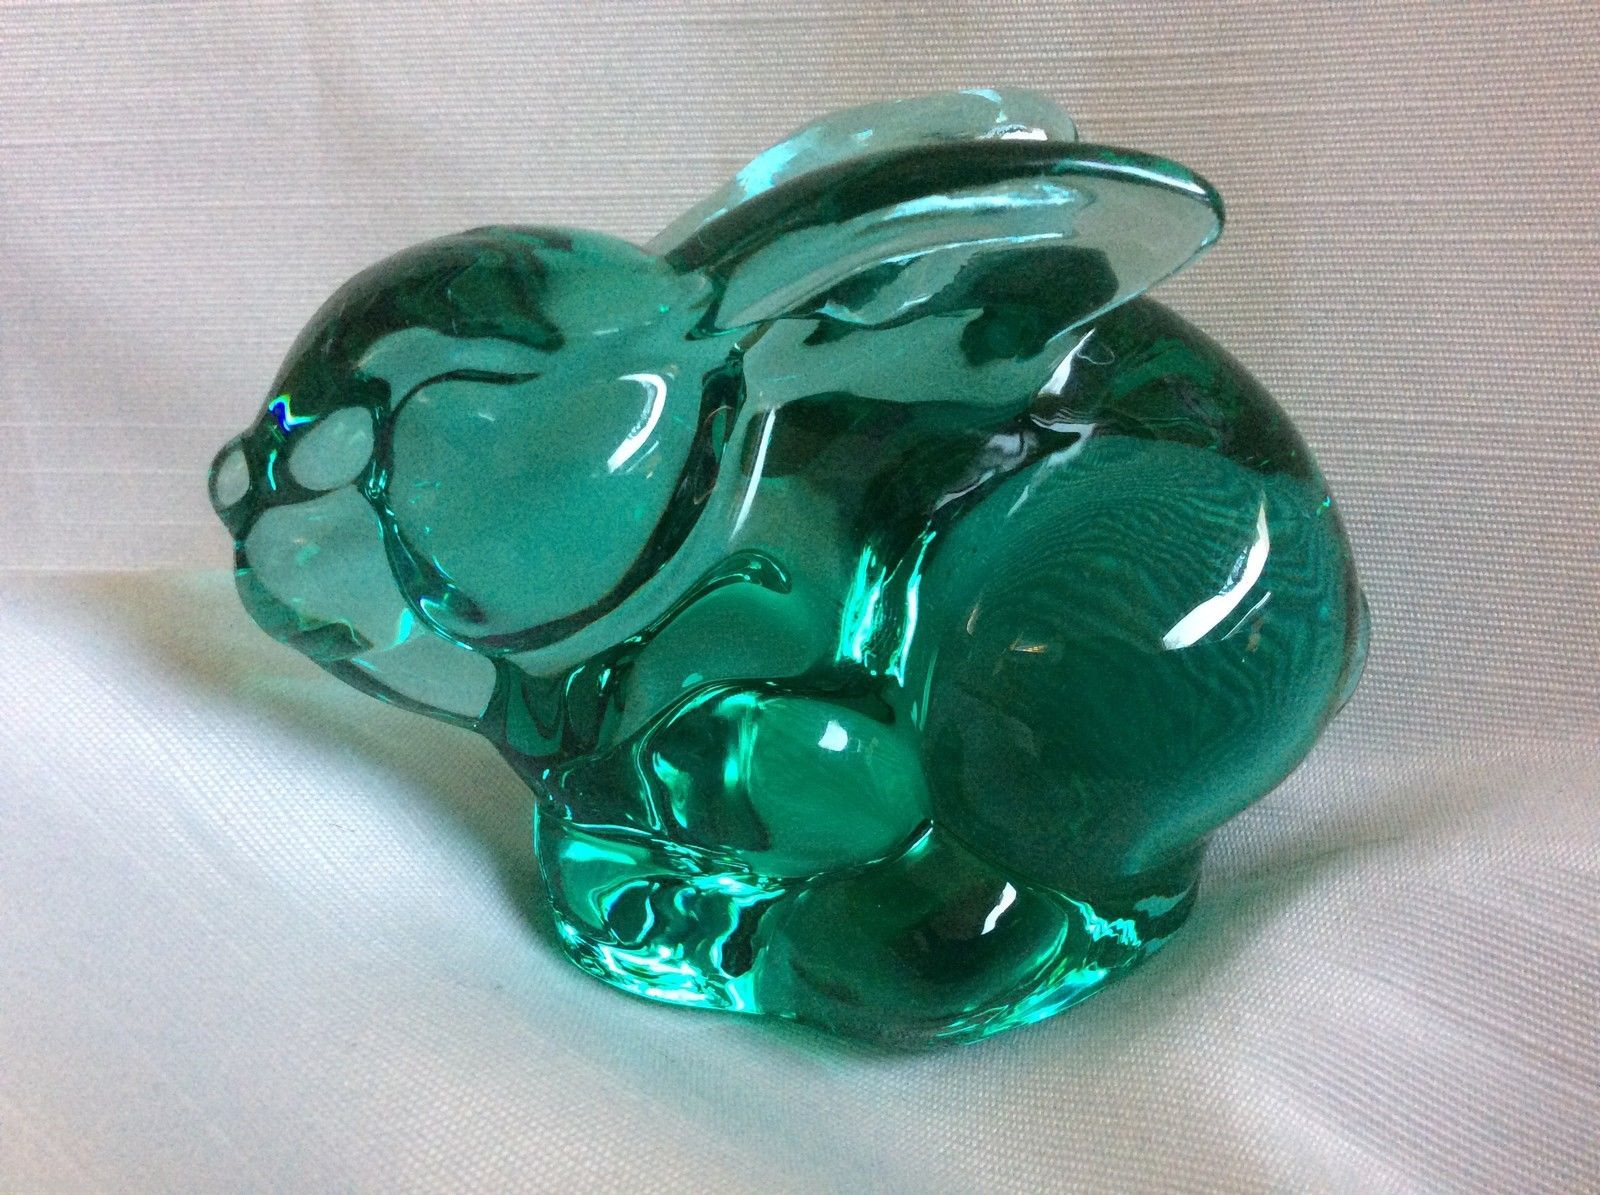 Vtg Silvestri Clear Green Art Glass Rabbit Bunny Figurine Paperweight | eBay